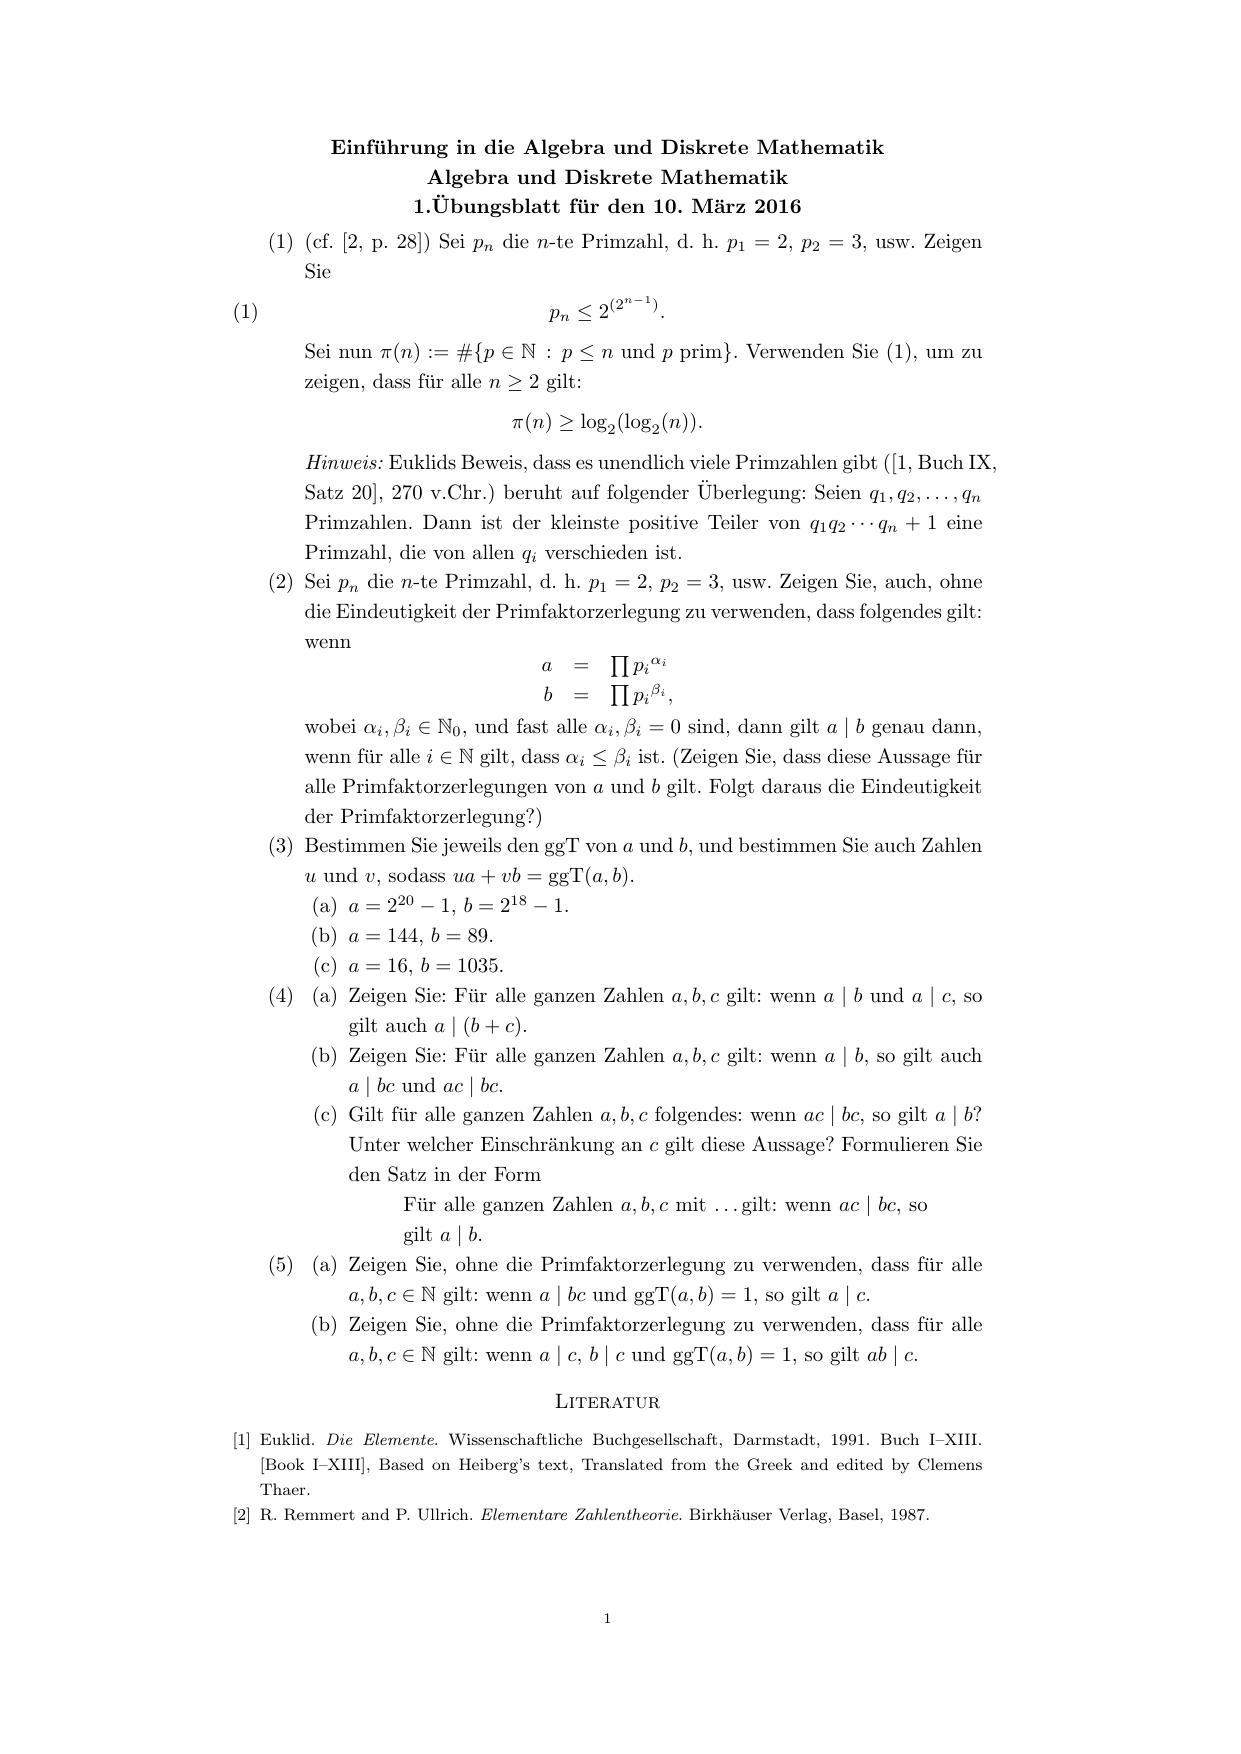 Schön Abschätzen Quotienten Kompatibel Zahlen Arbeitsblatt Bilder ...